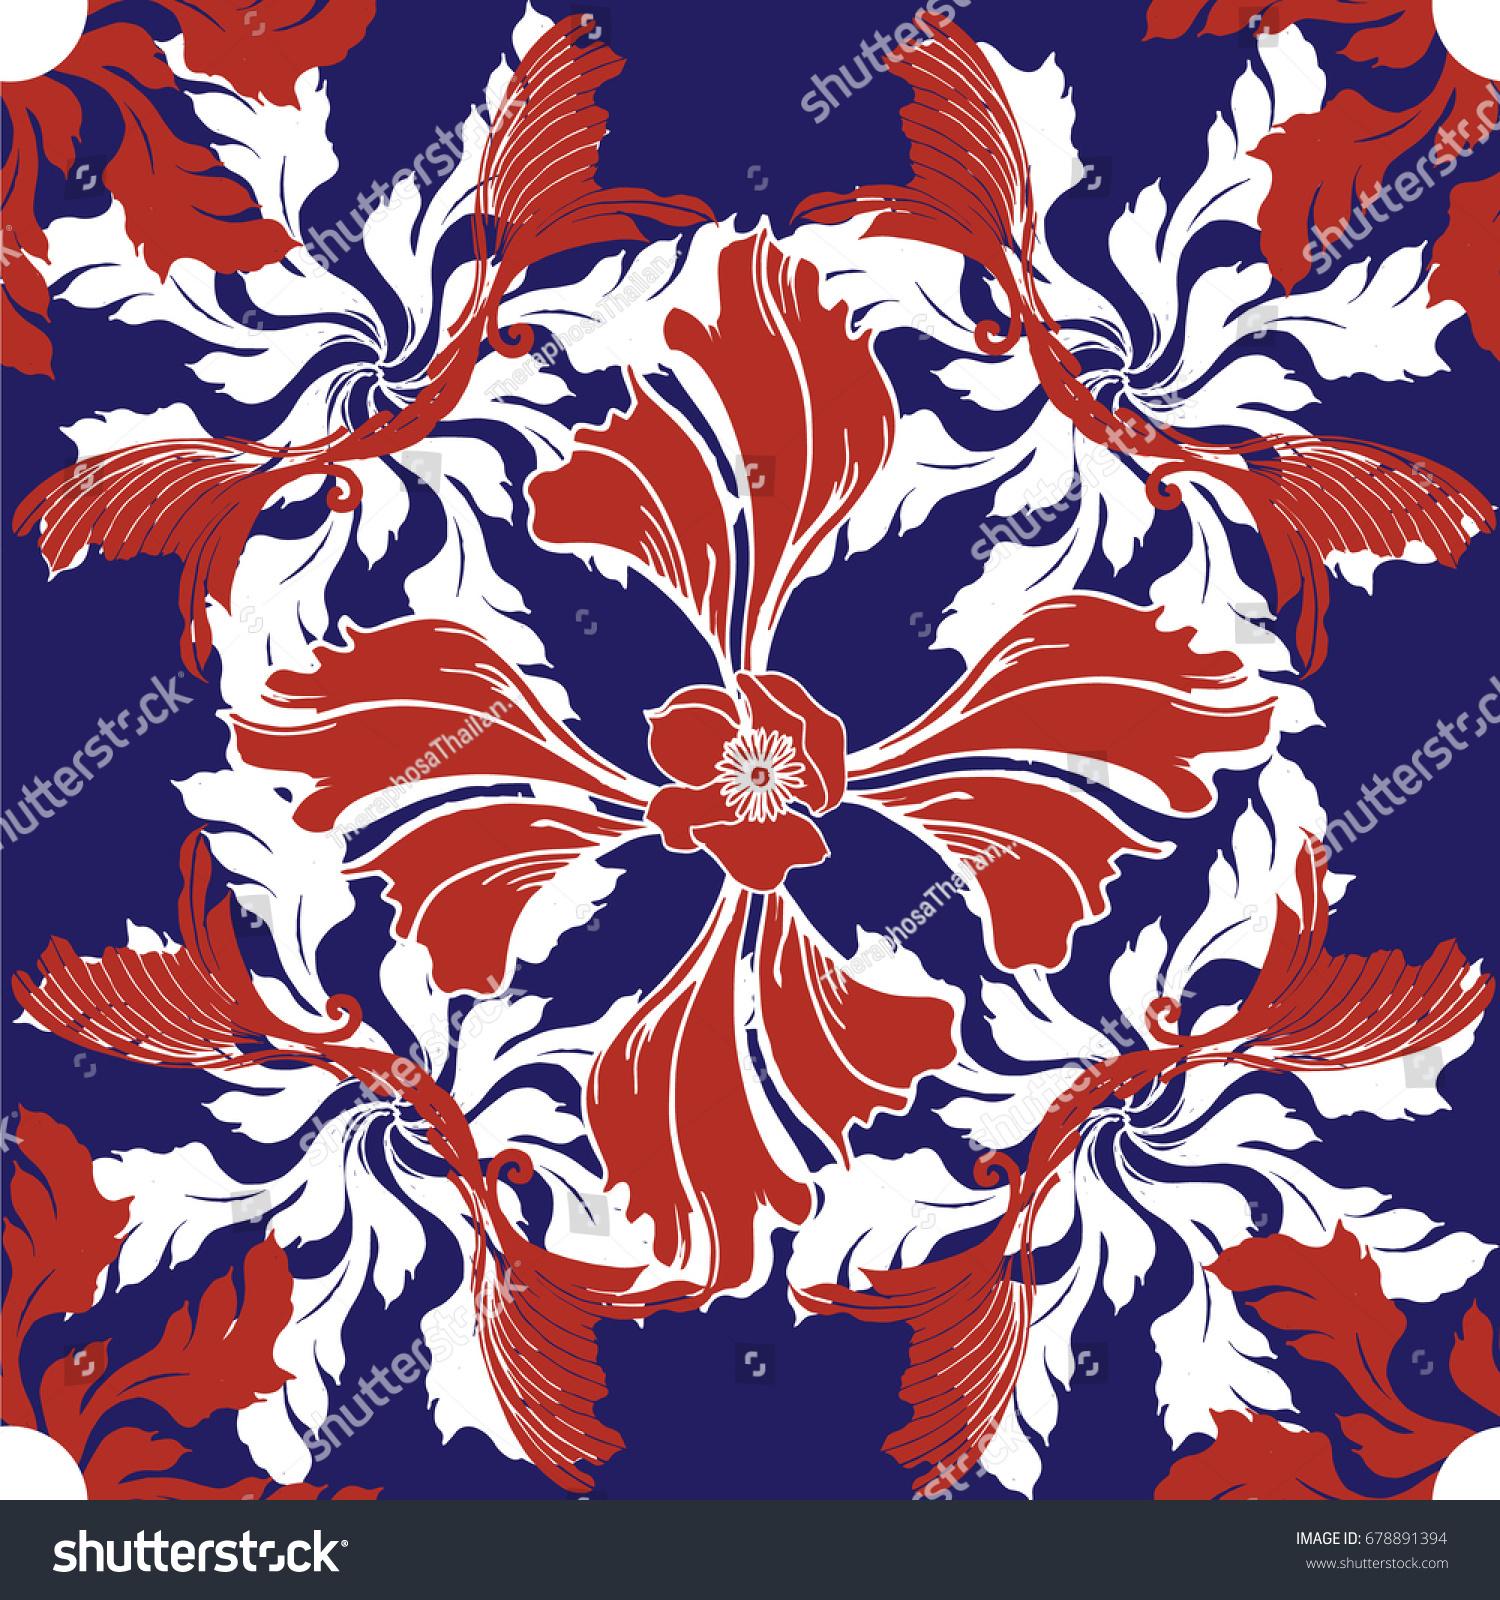 pattern ceramic tile colorful vintage pattern stock vector pattern ceramic tile with colorful vintage pattern in